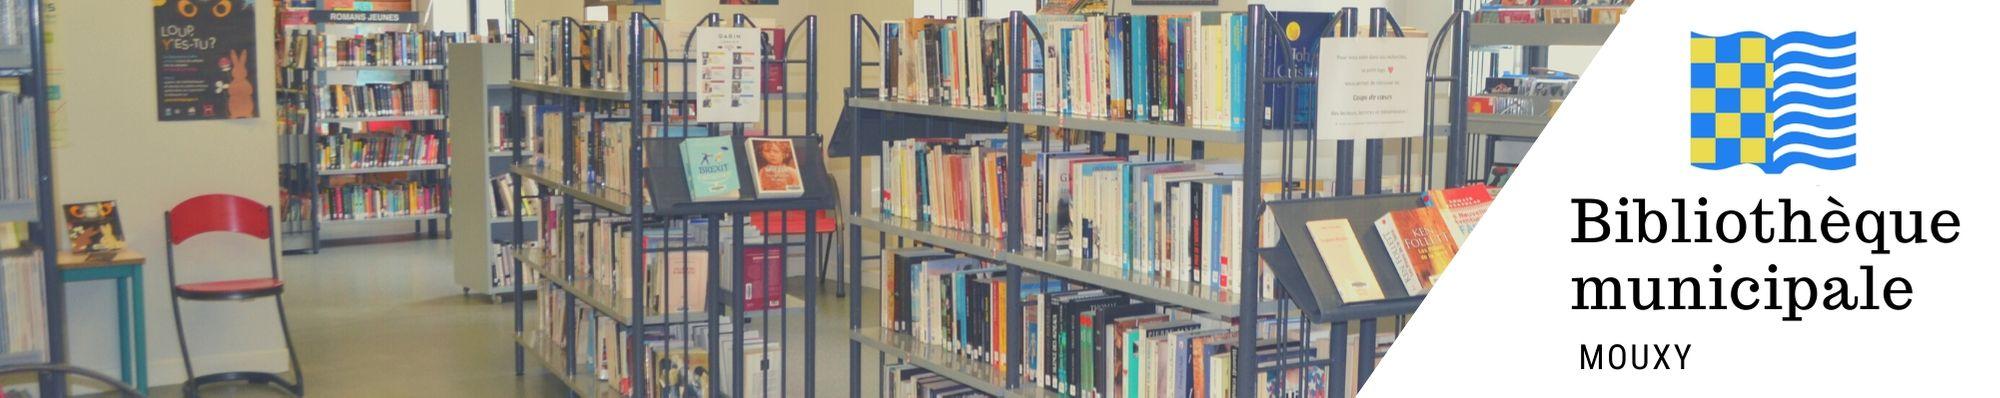 Bibliothèque de Mouxy